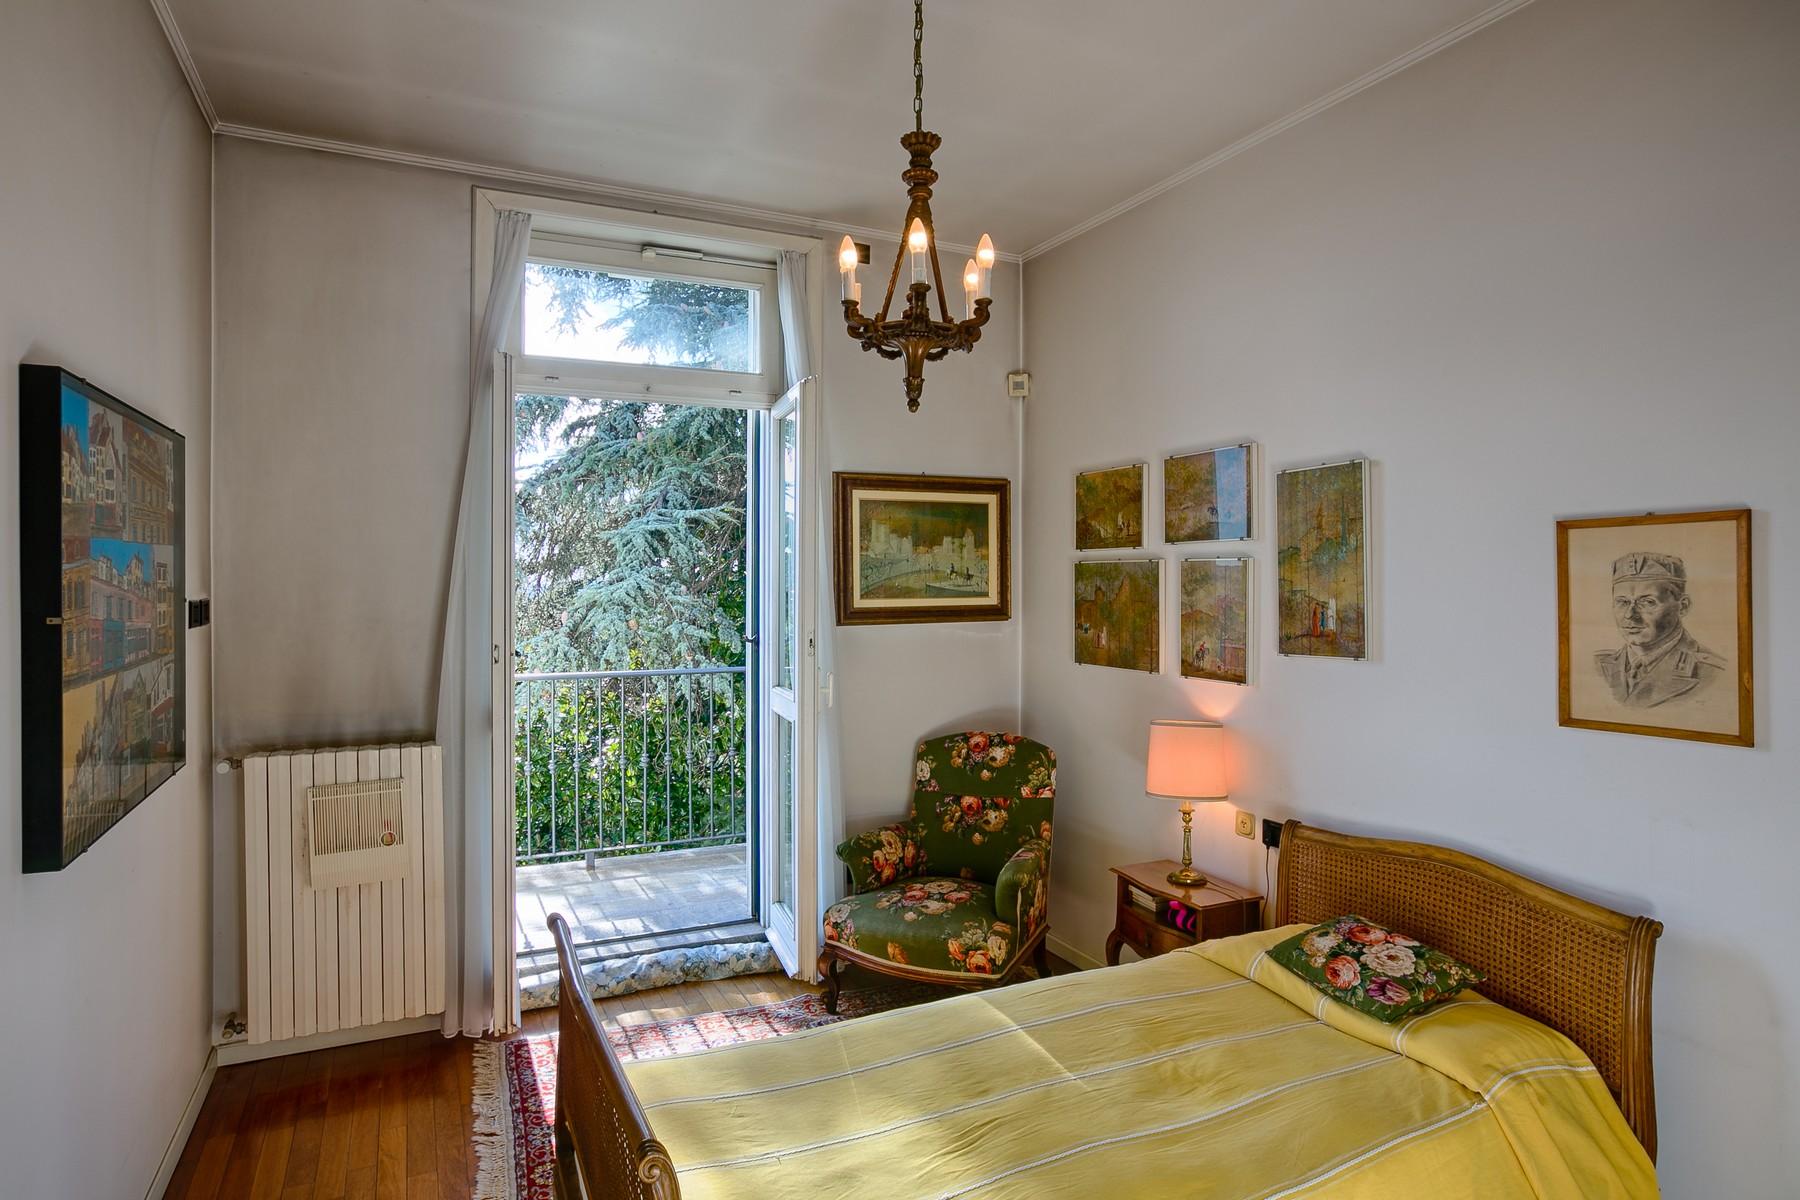 Additional photo for property listing at Unique period villa with panoramic view via Meda Inverigo, Como 22044 Italia